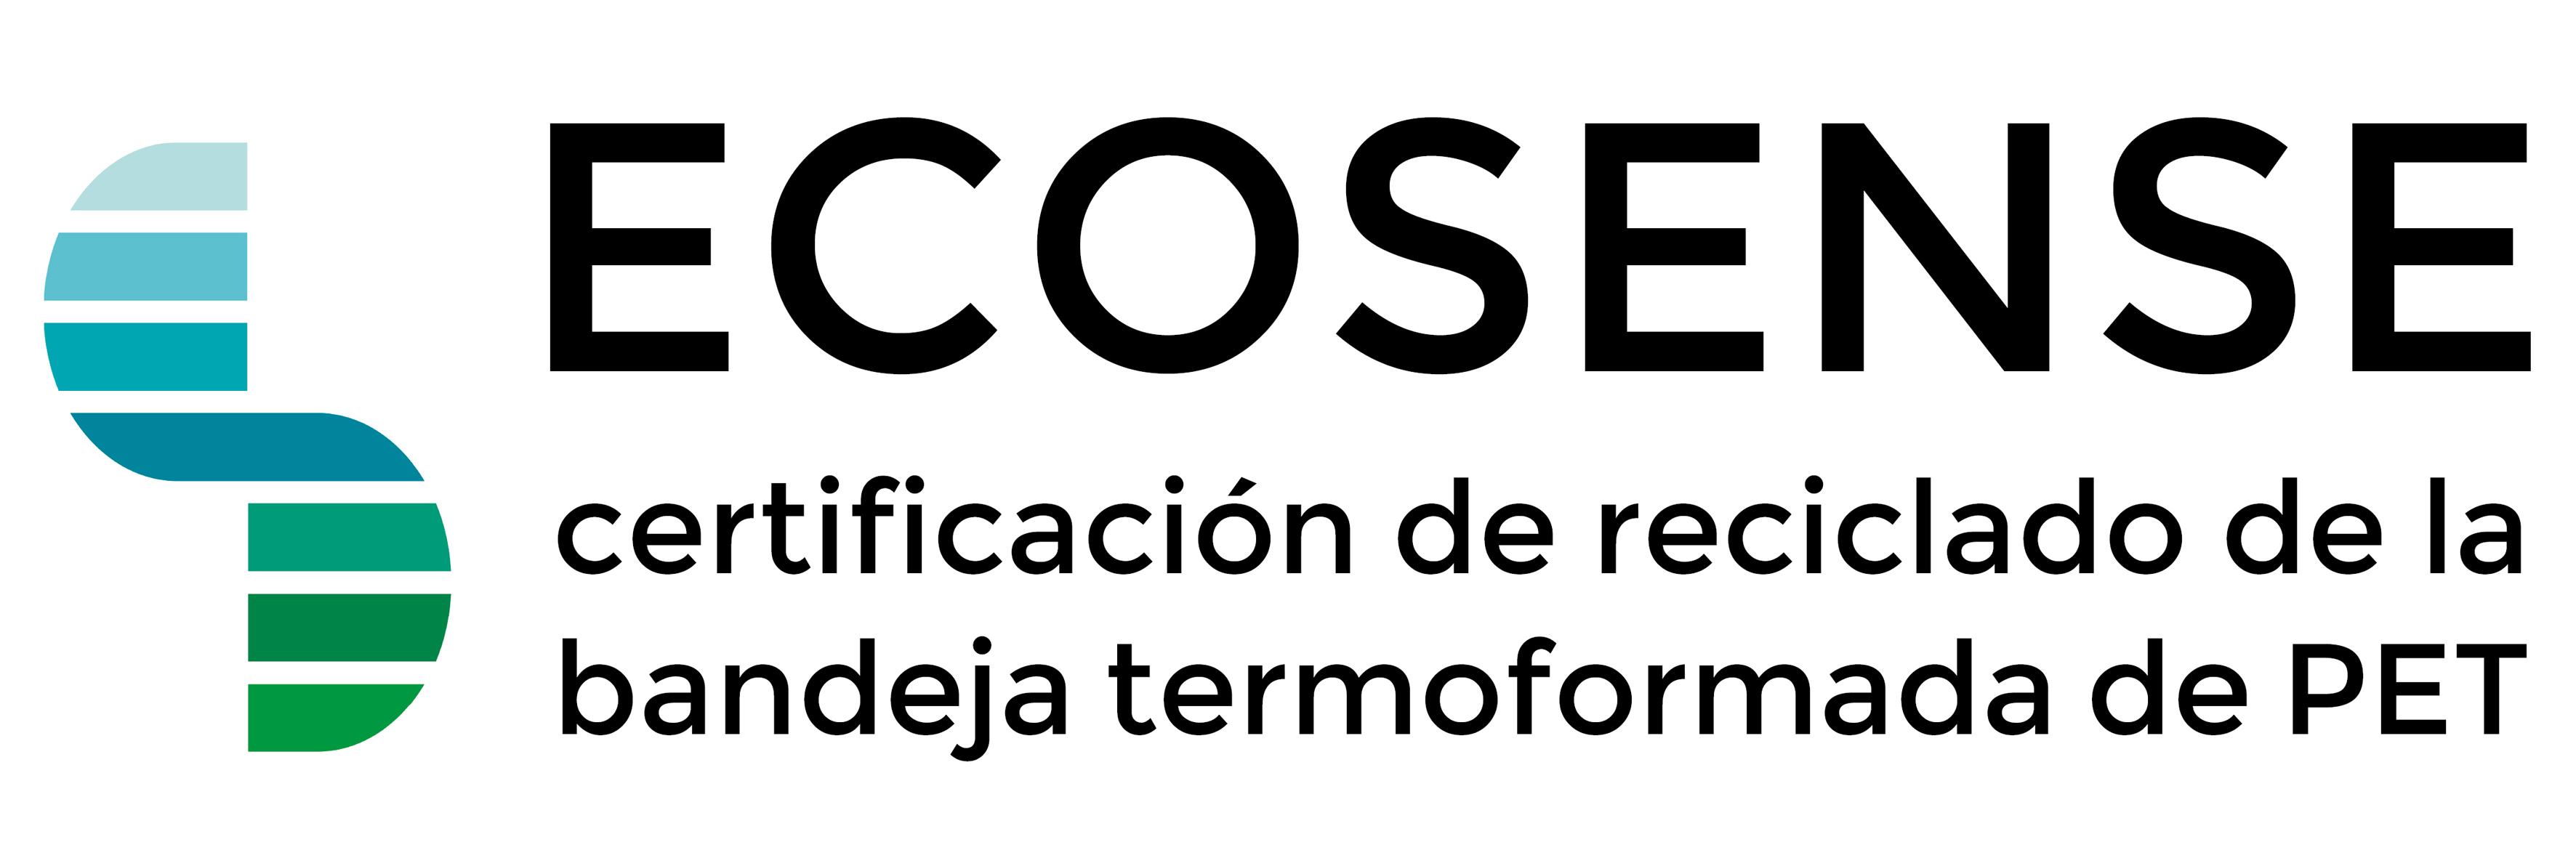 ecosense-emblema-tipo-1.jpg